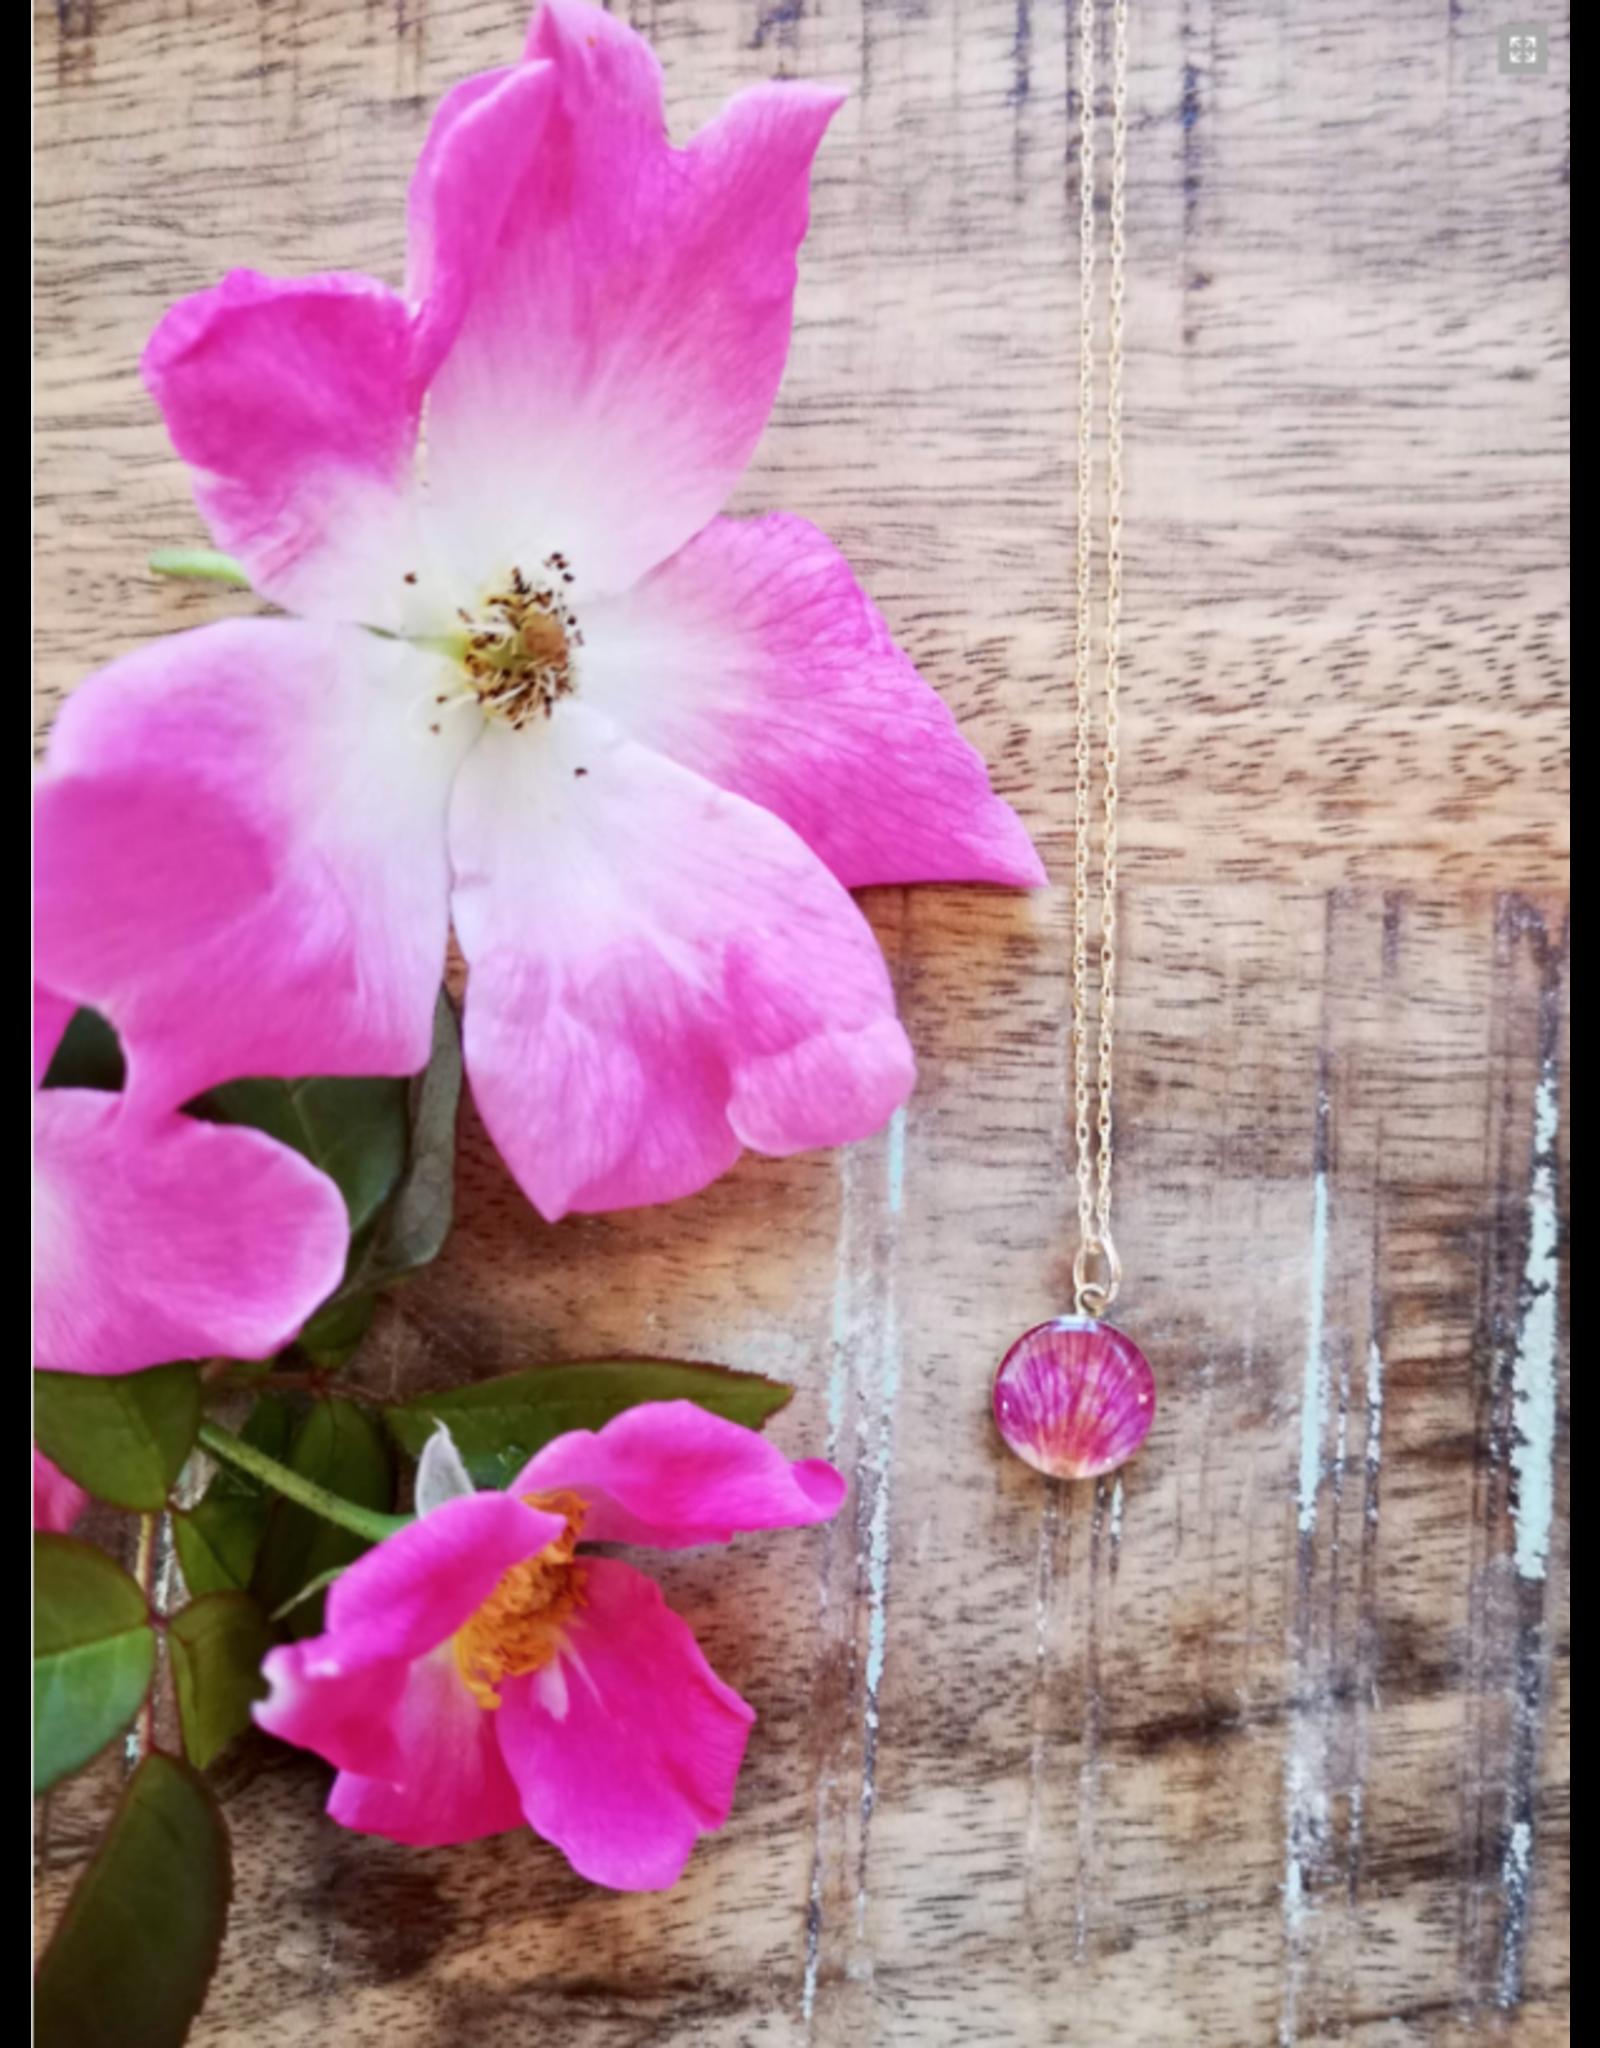 Collier Plaqué Or Rose Sauvage de l'Alberta 12mm  - AB0112G